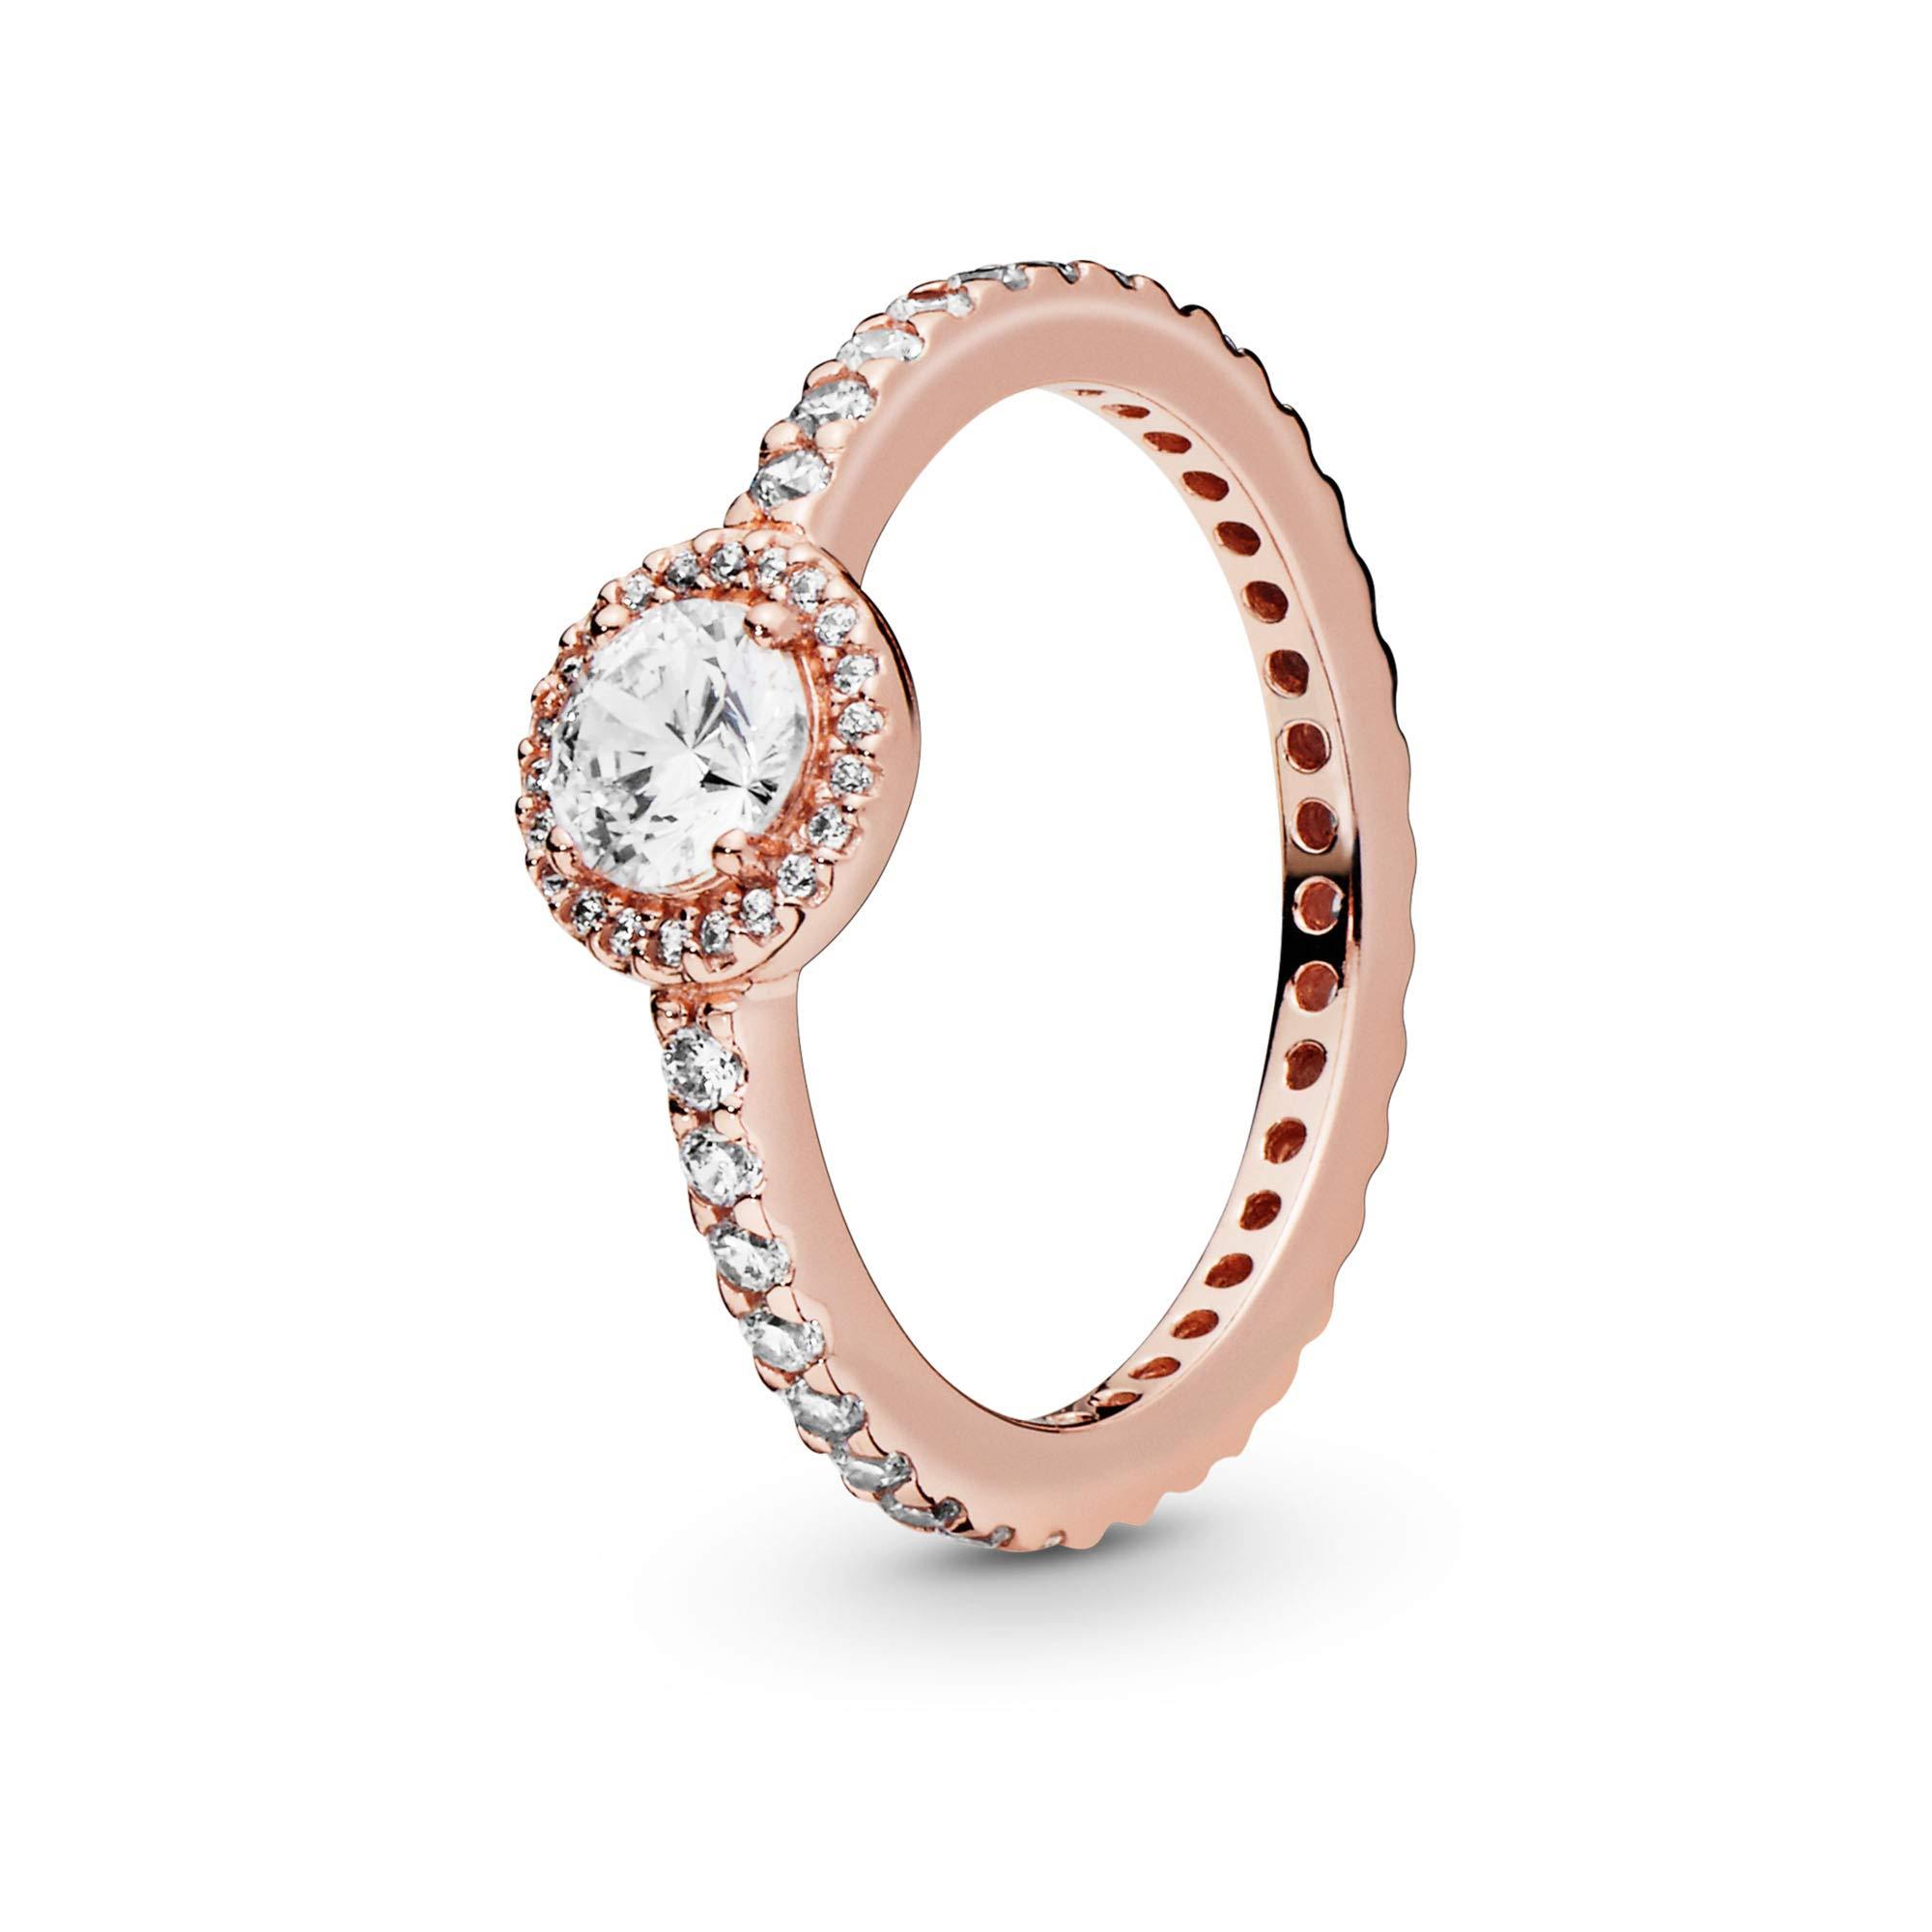 Pandora Jewelry Classic Sparkle Halo Cubic Zirconia Ring in Pandora Rose, Size 4.5